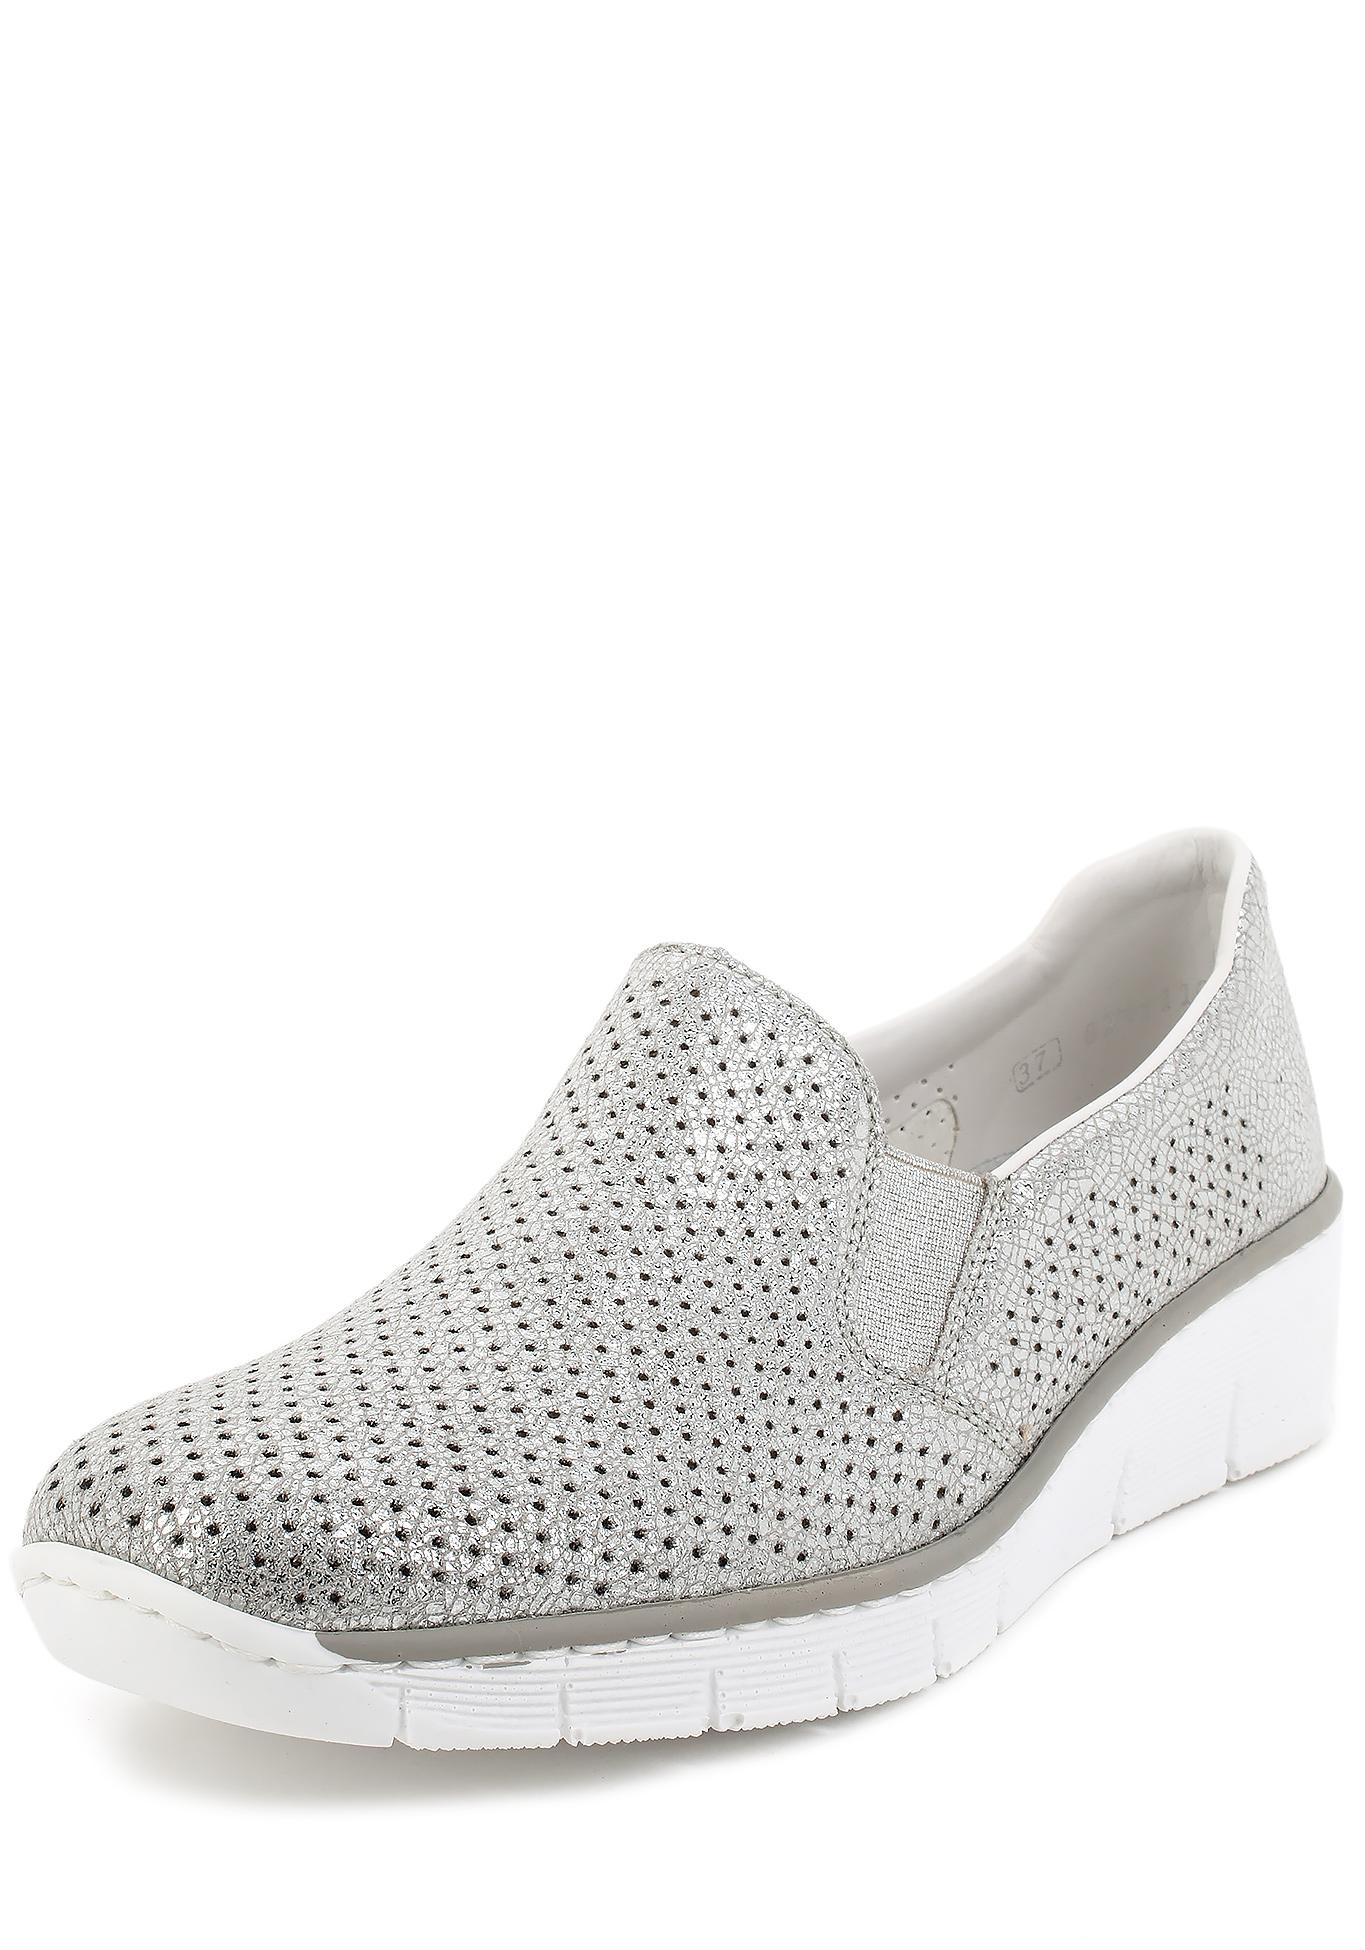 Туфли женские Камилла